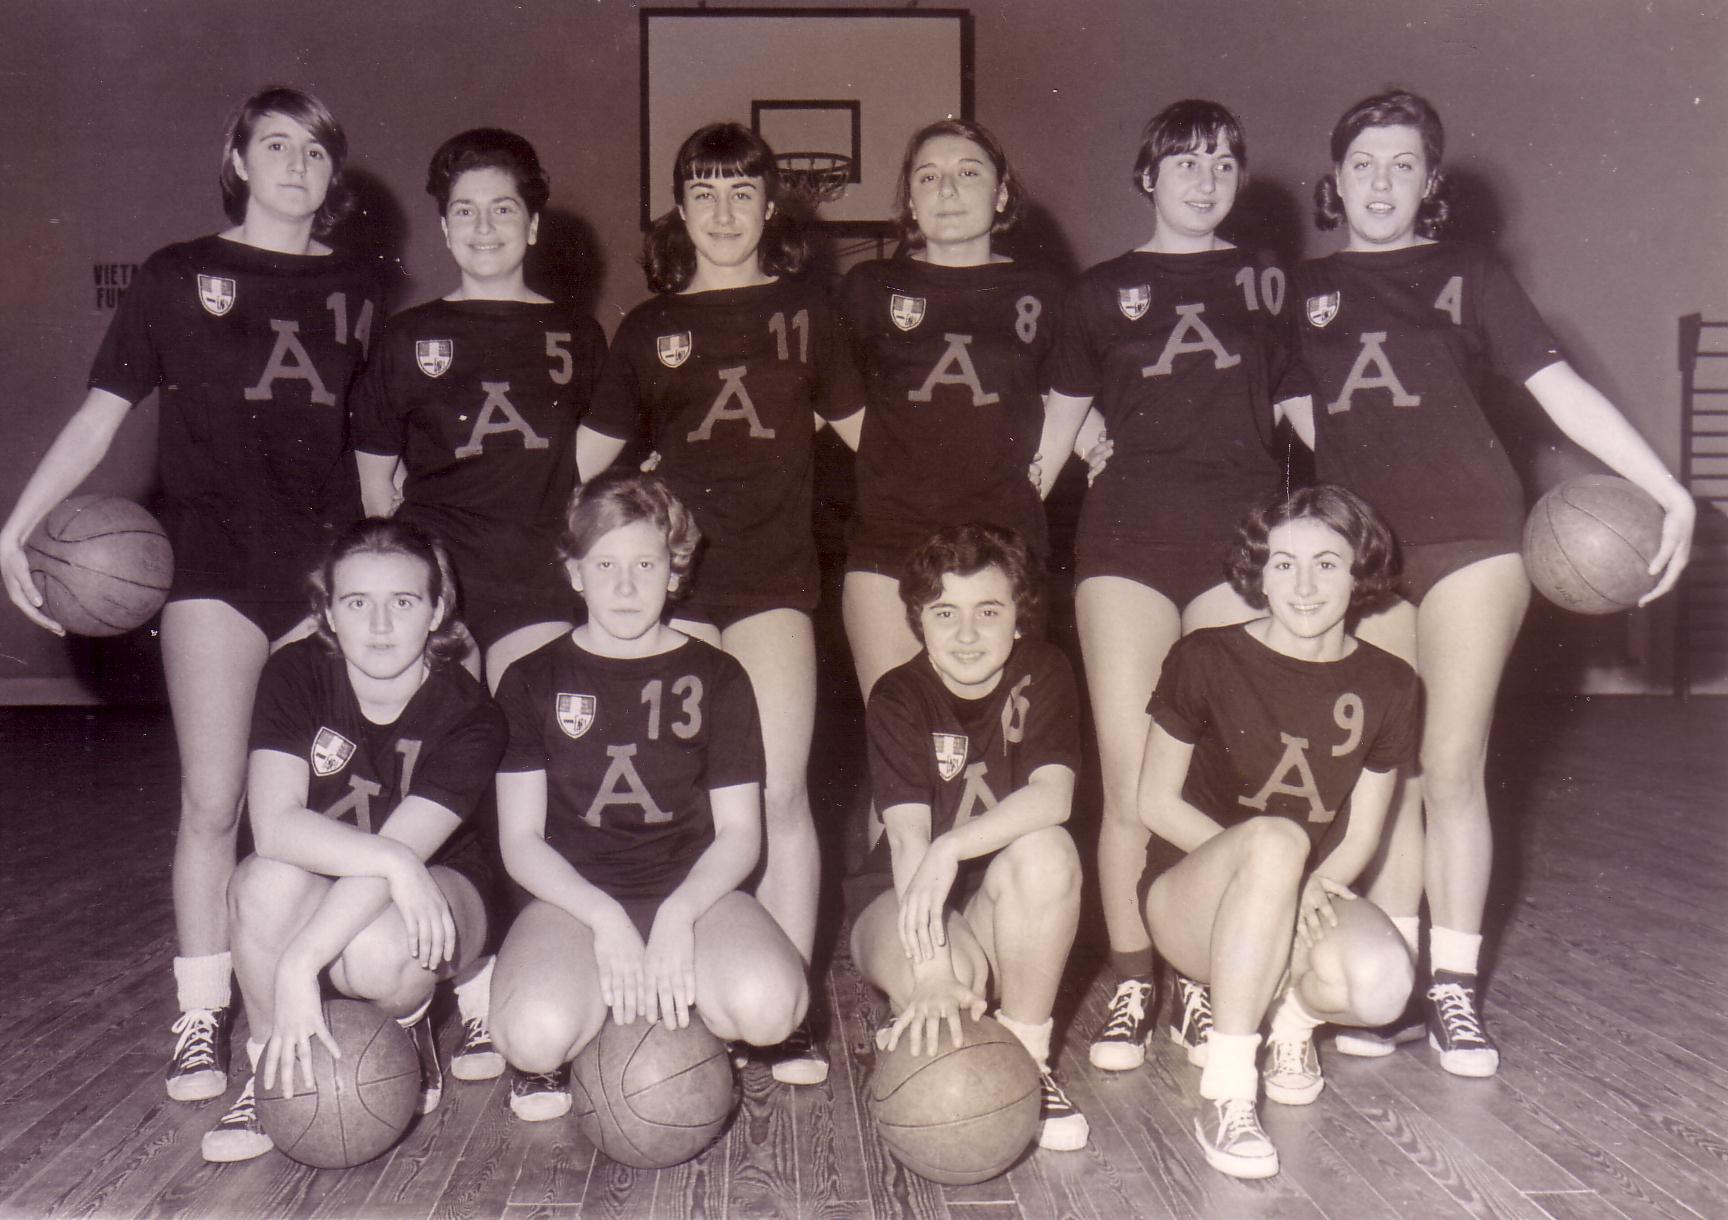 camp-to-serie-b-femm-le-1965-1966